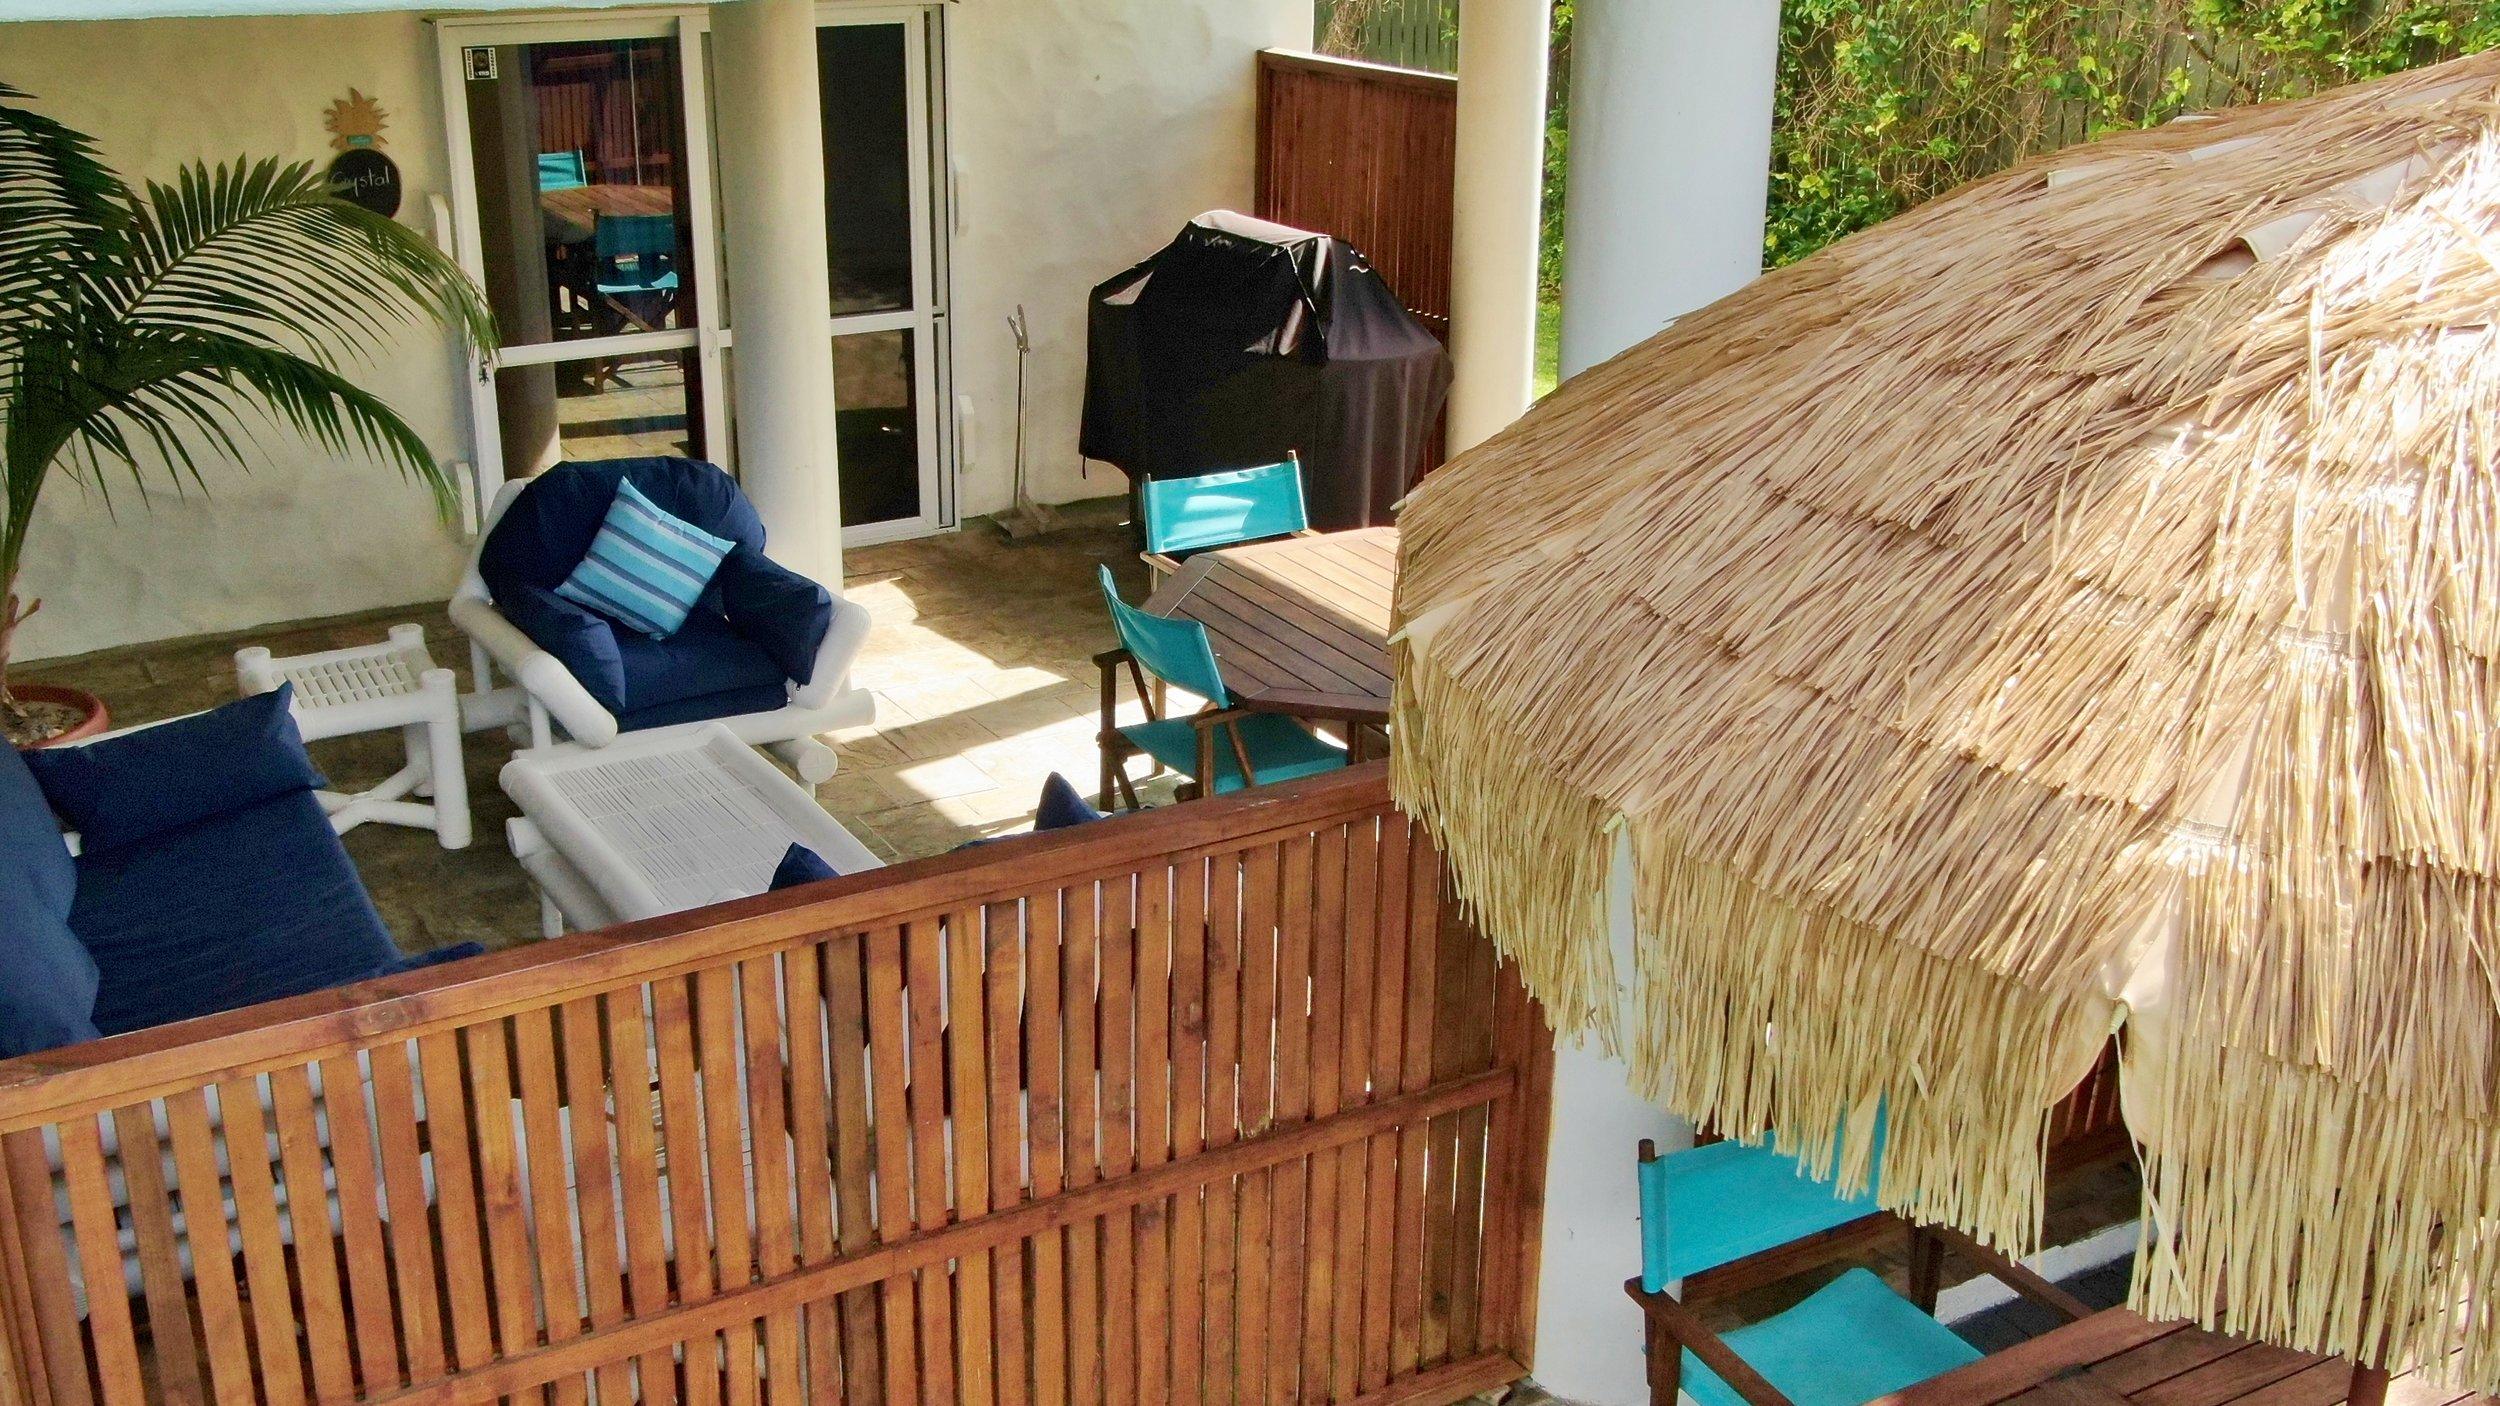 Pool room terrace area